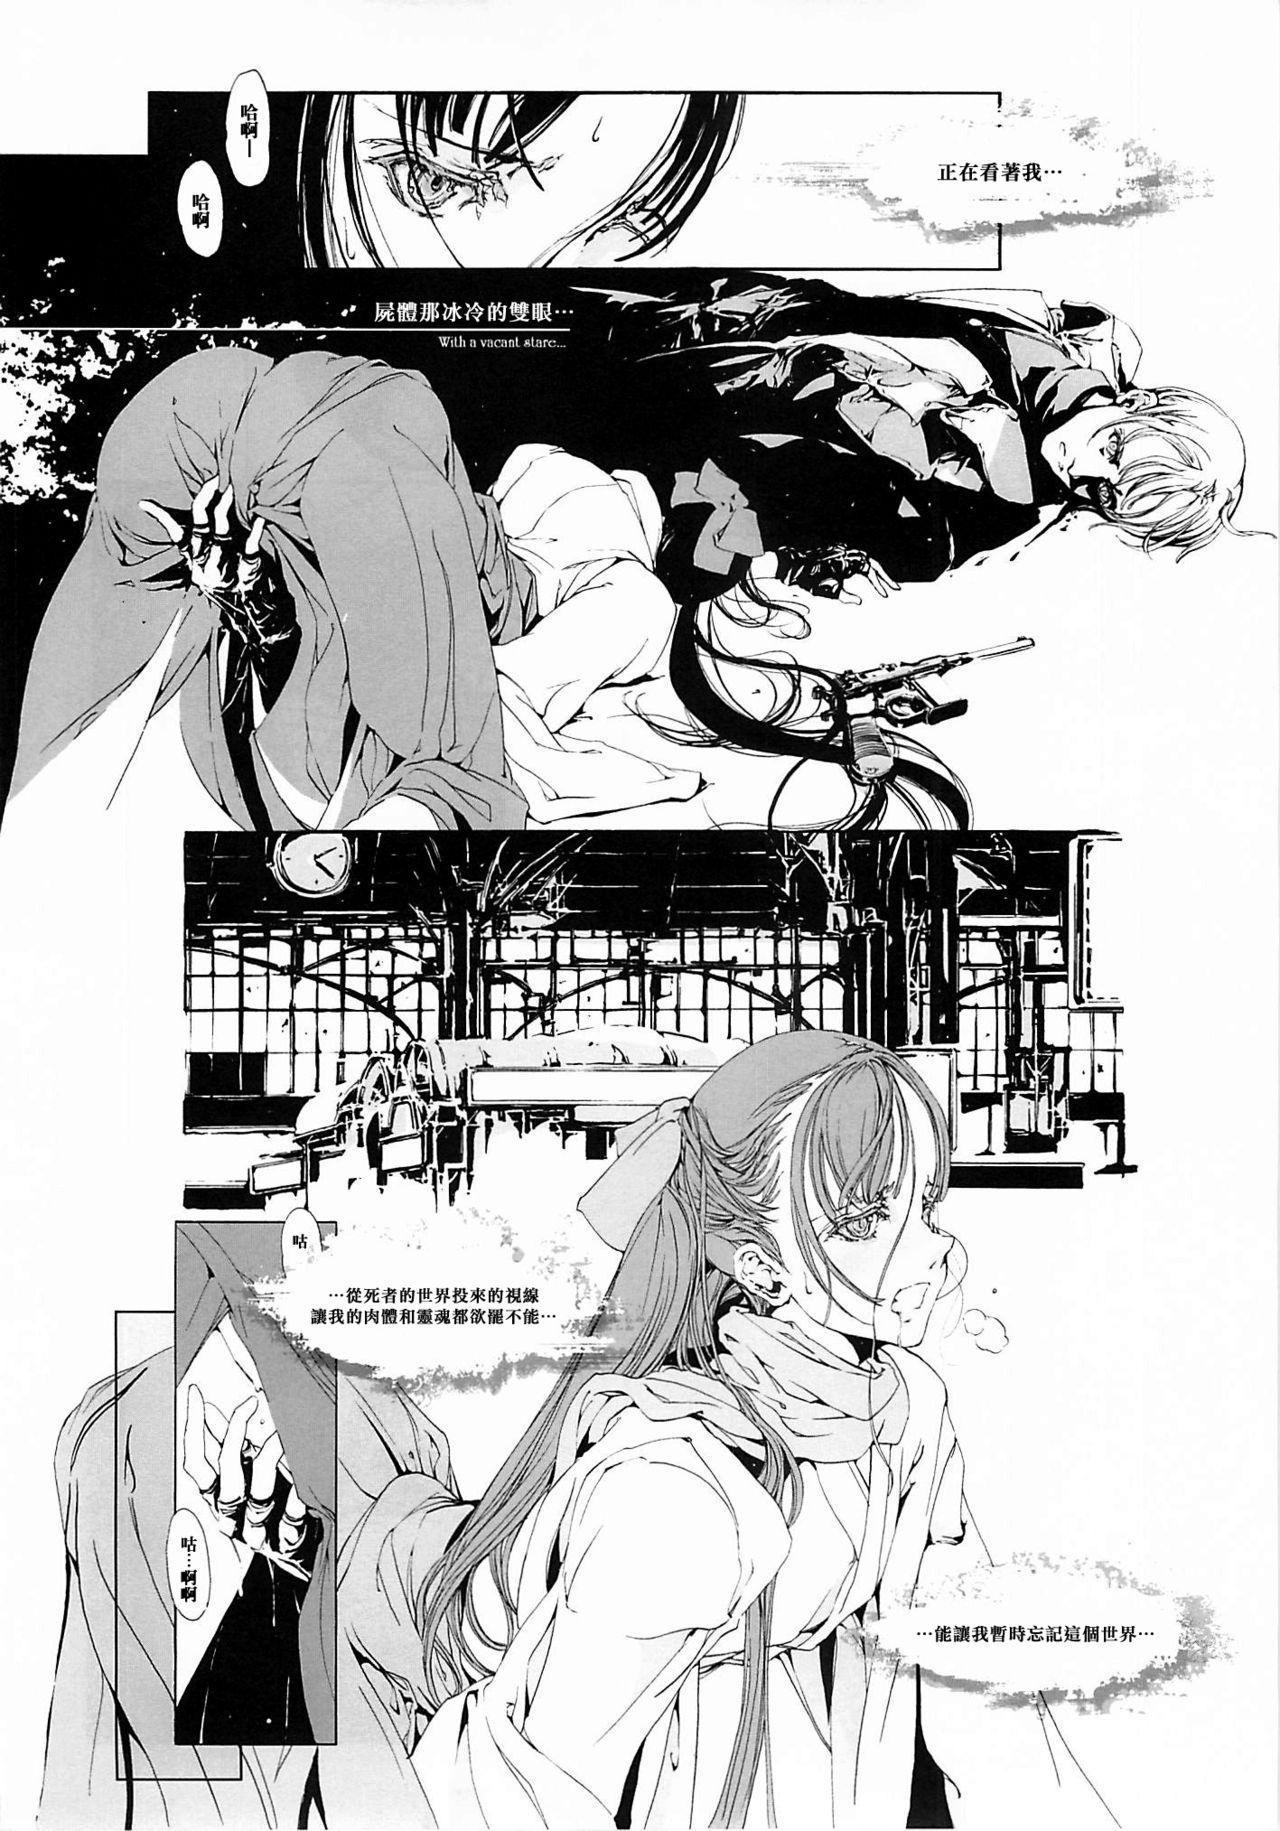 (CR37) [70 Nenshiki Yuukyuu Kikan (Endou Okito)] ORGAN-Tino  01-02[Chinese] [拾荒者汉化组] [Incomplete] 42